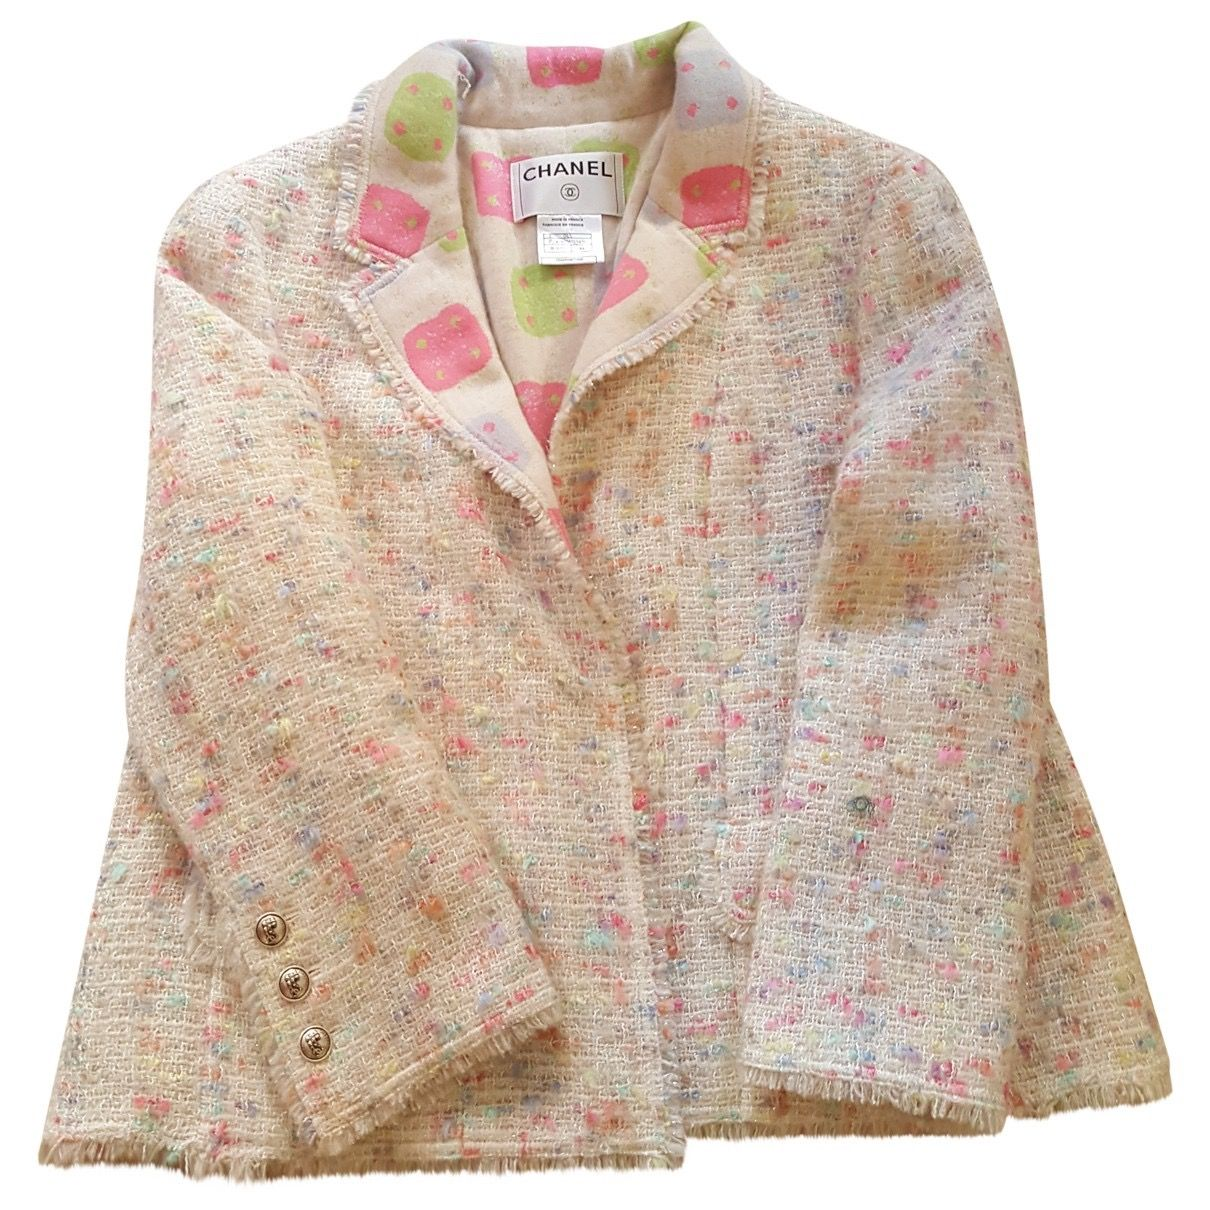 CHANEL Tweed suit jacket